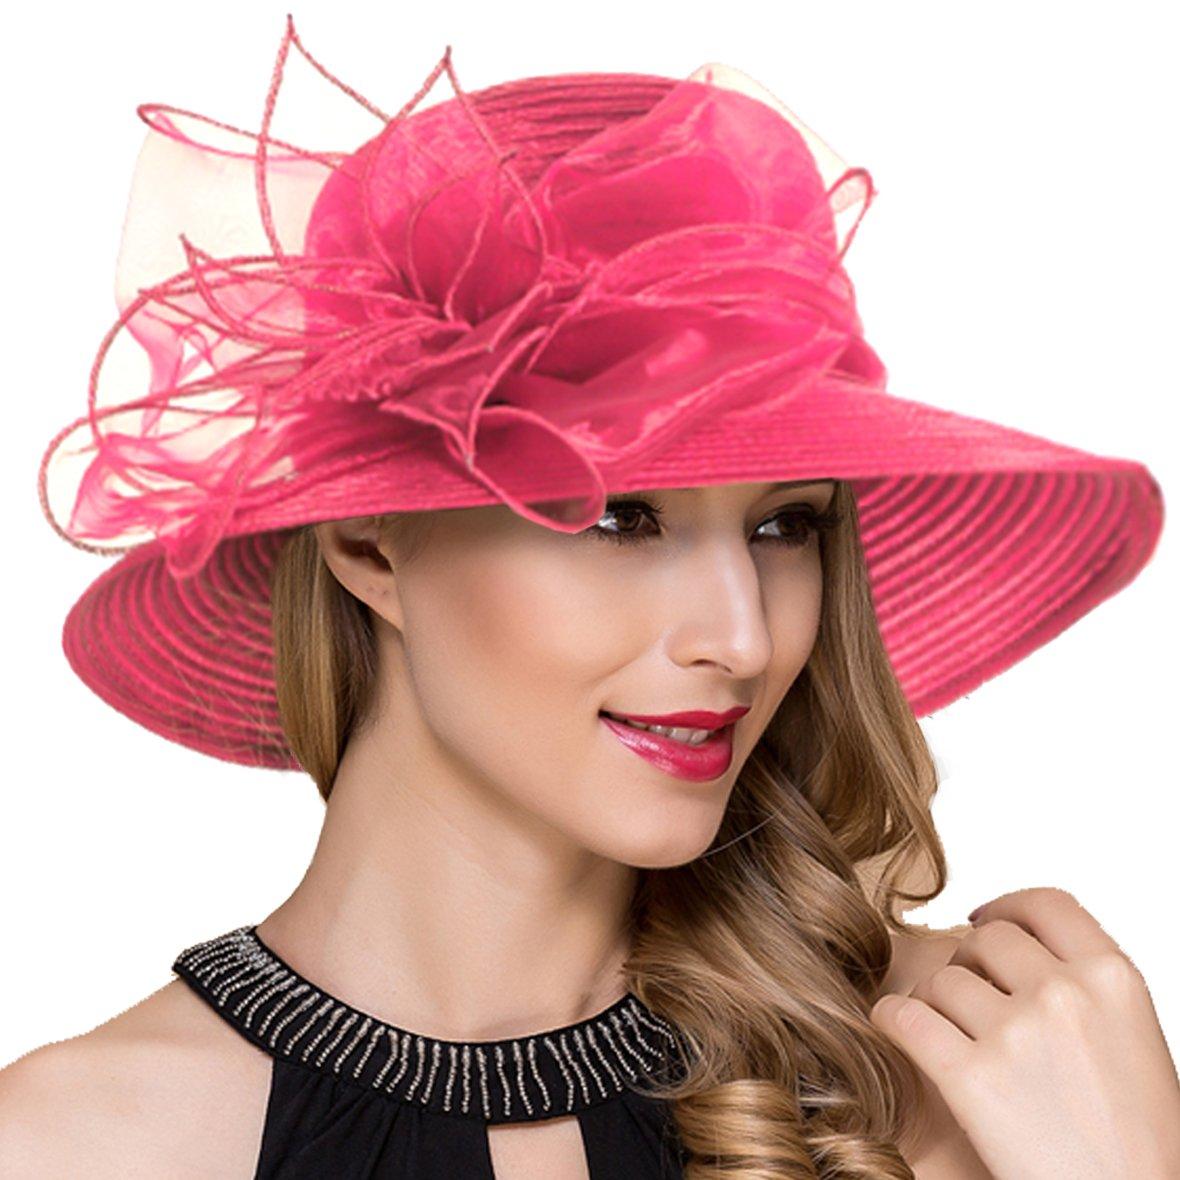 Womens Royal Ascot Derby Cloche Hats British Church Dress Tea Party Hat S051